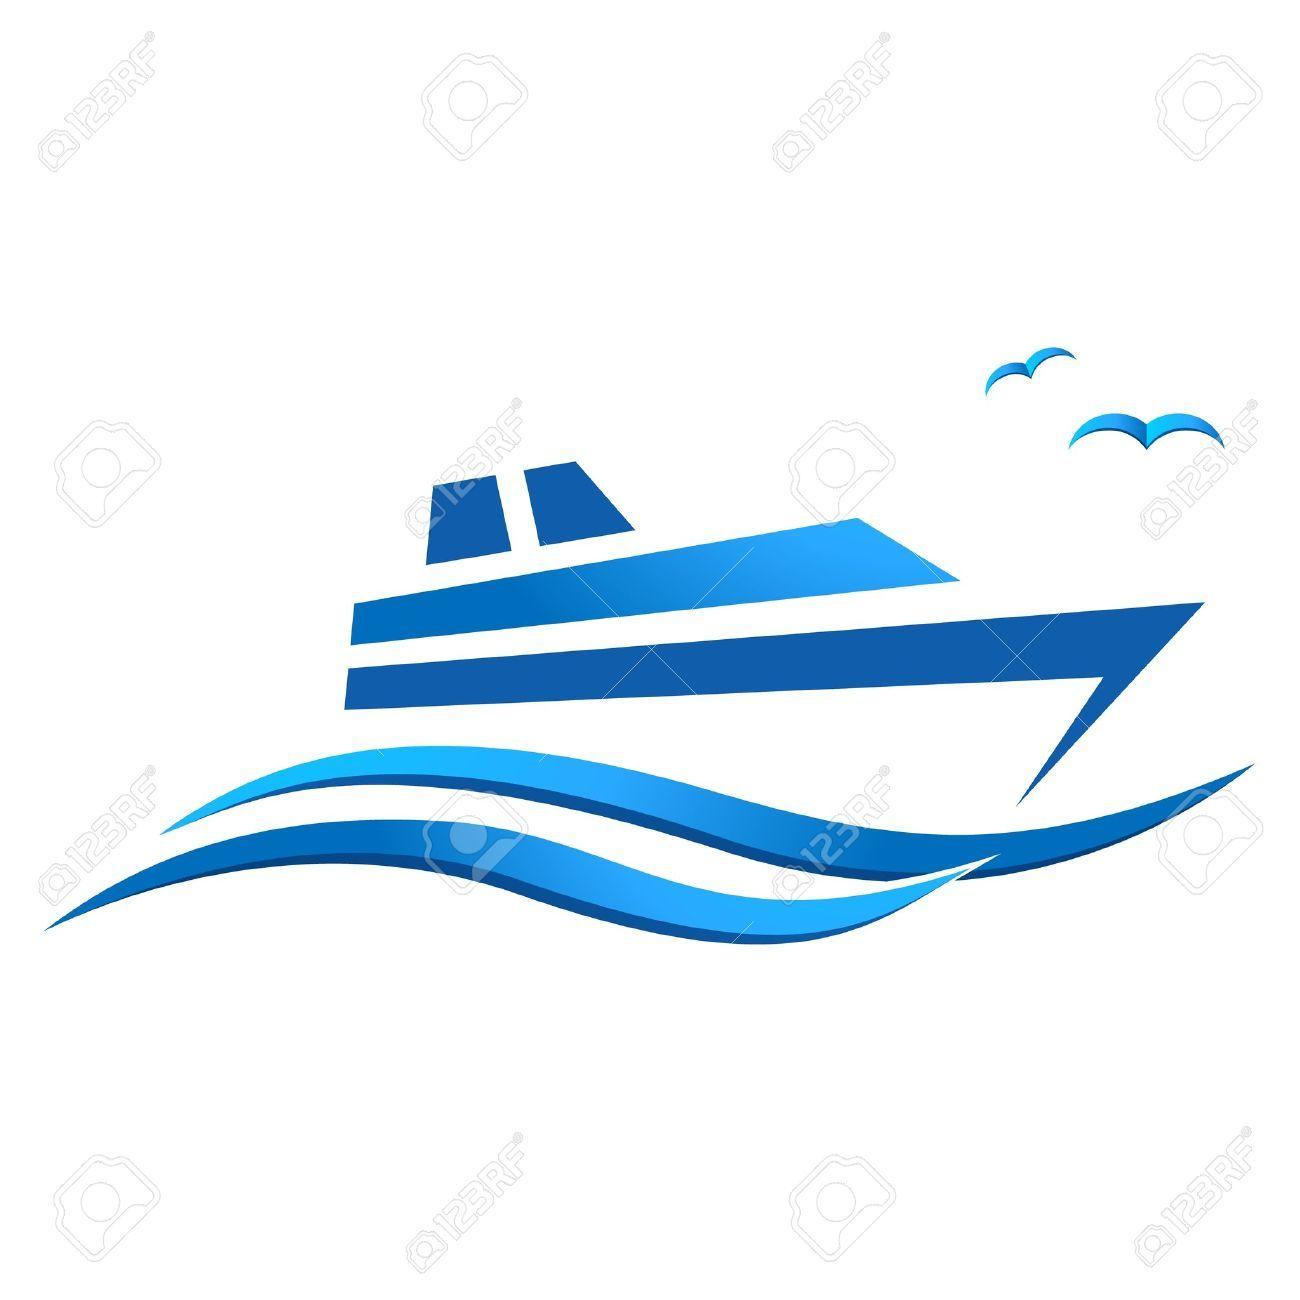 clip art cruise ship free google search alaskan cruise rh pinterest co uk cruise ship clip art black and white free cruise ship clip art black and white free